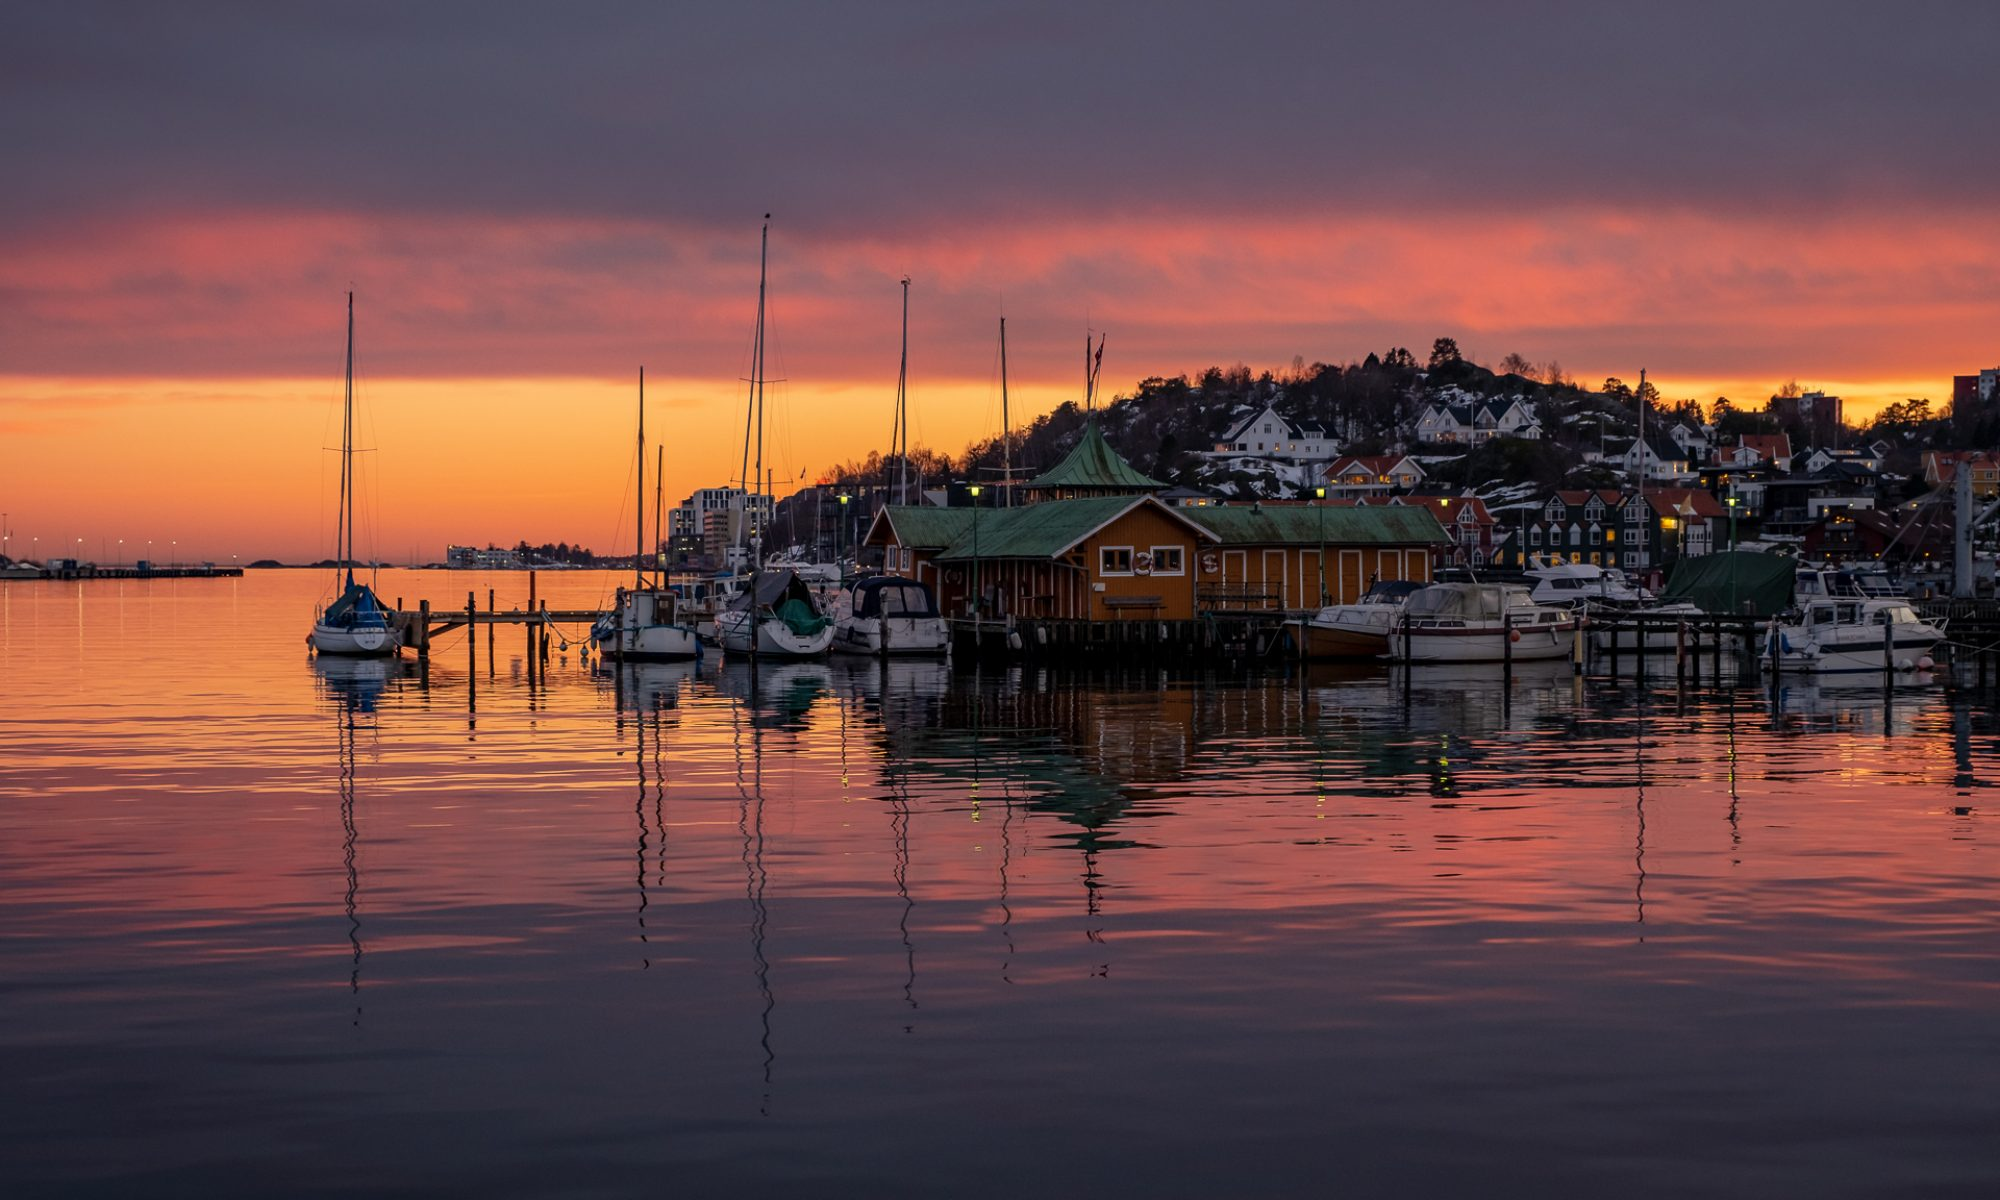 Sandefjord Fotoklubb